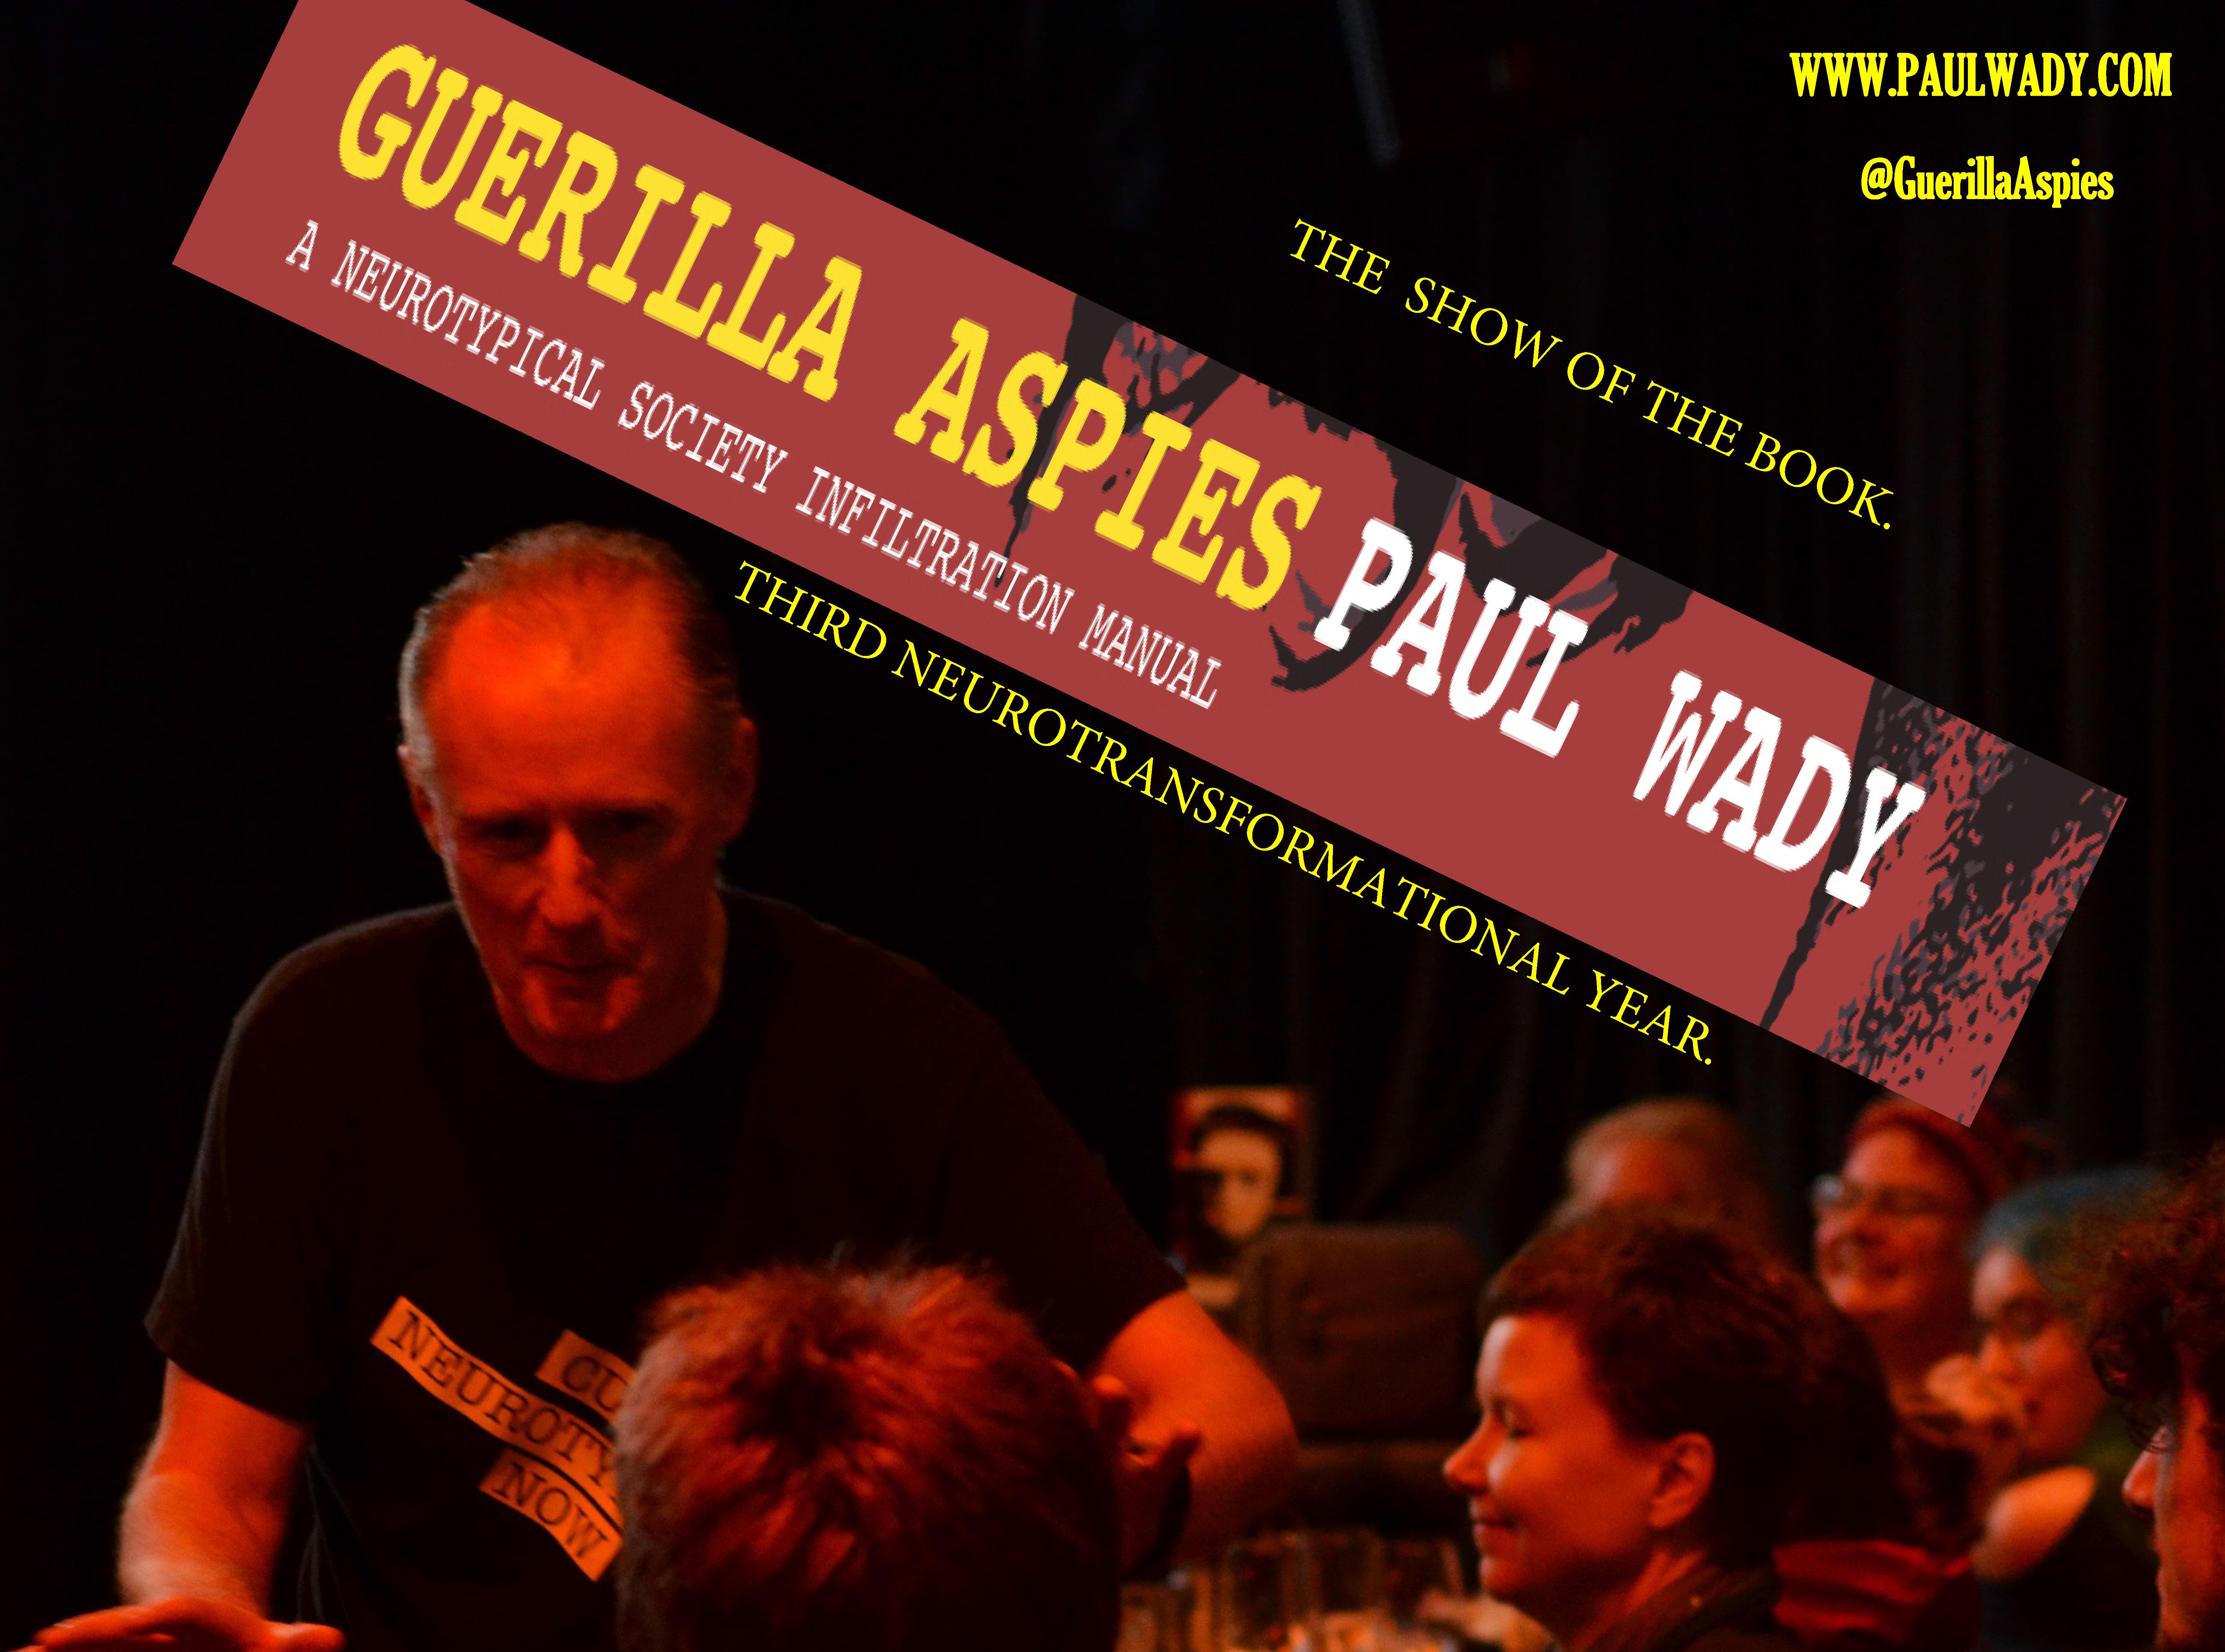 Guerilla aspies show 2017 Three